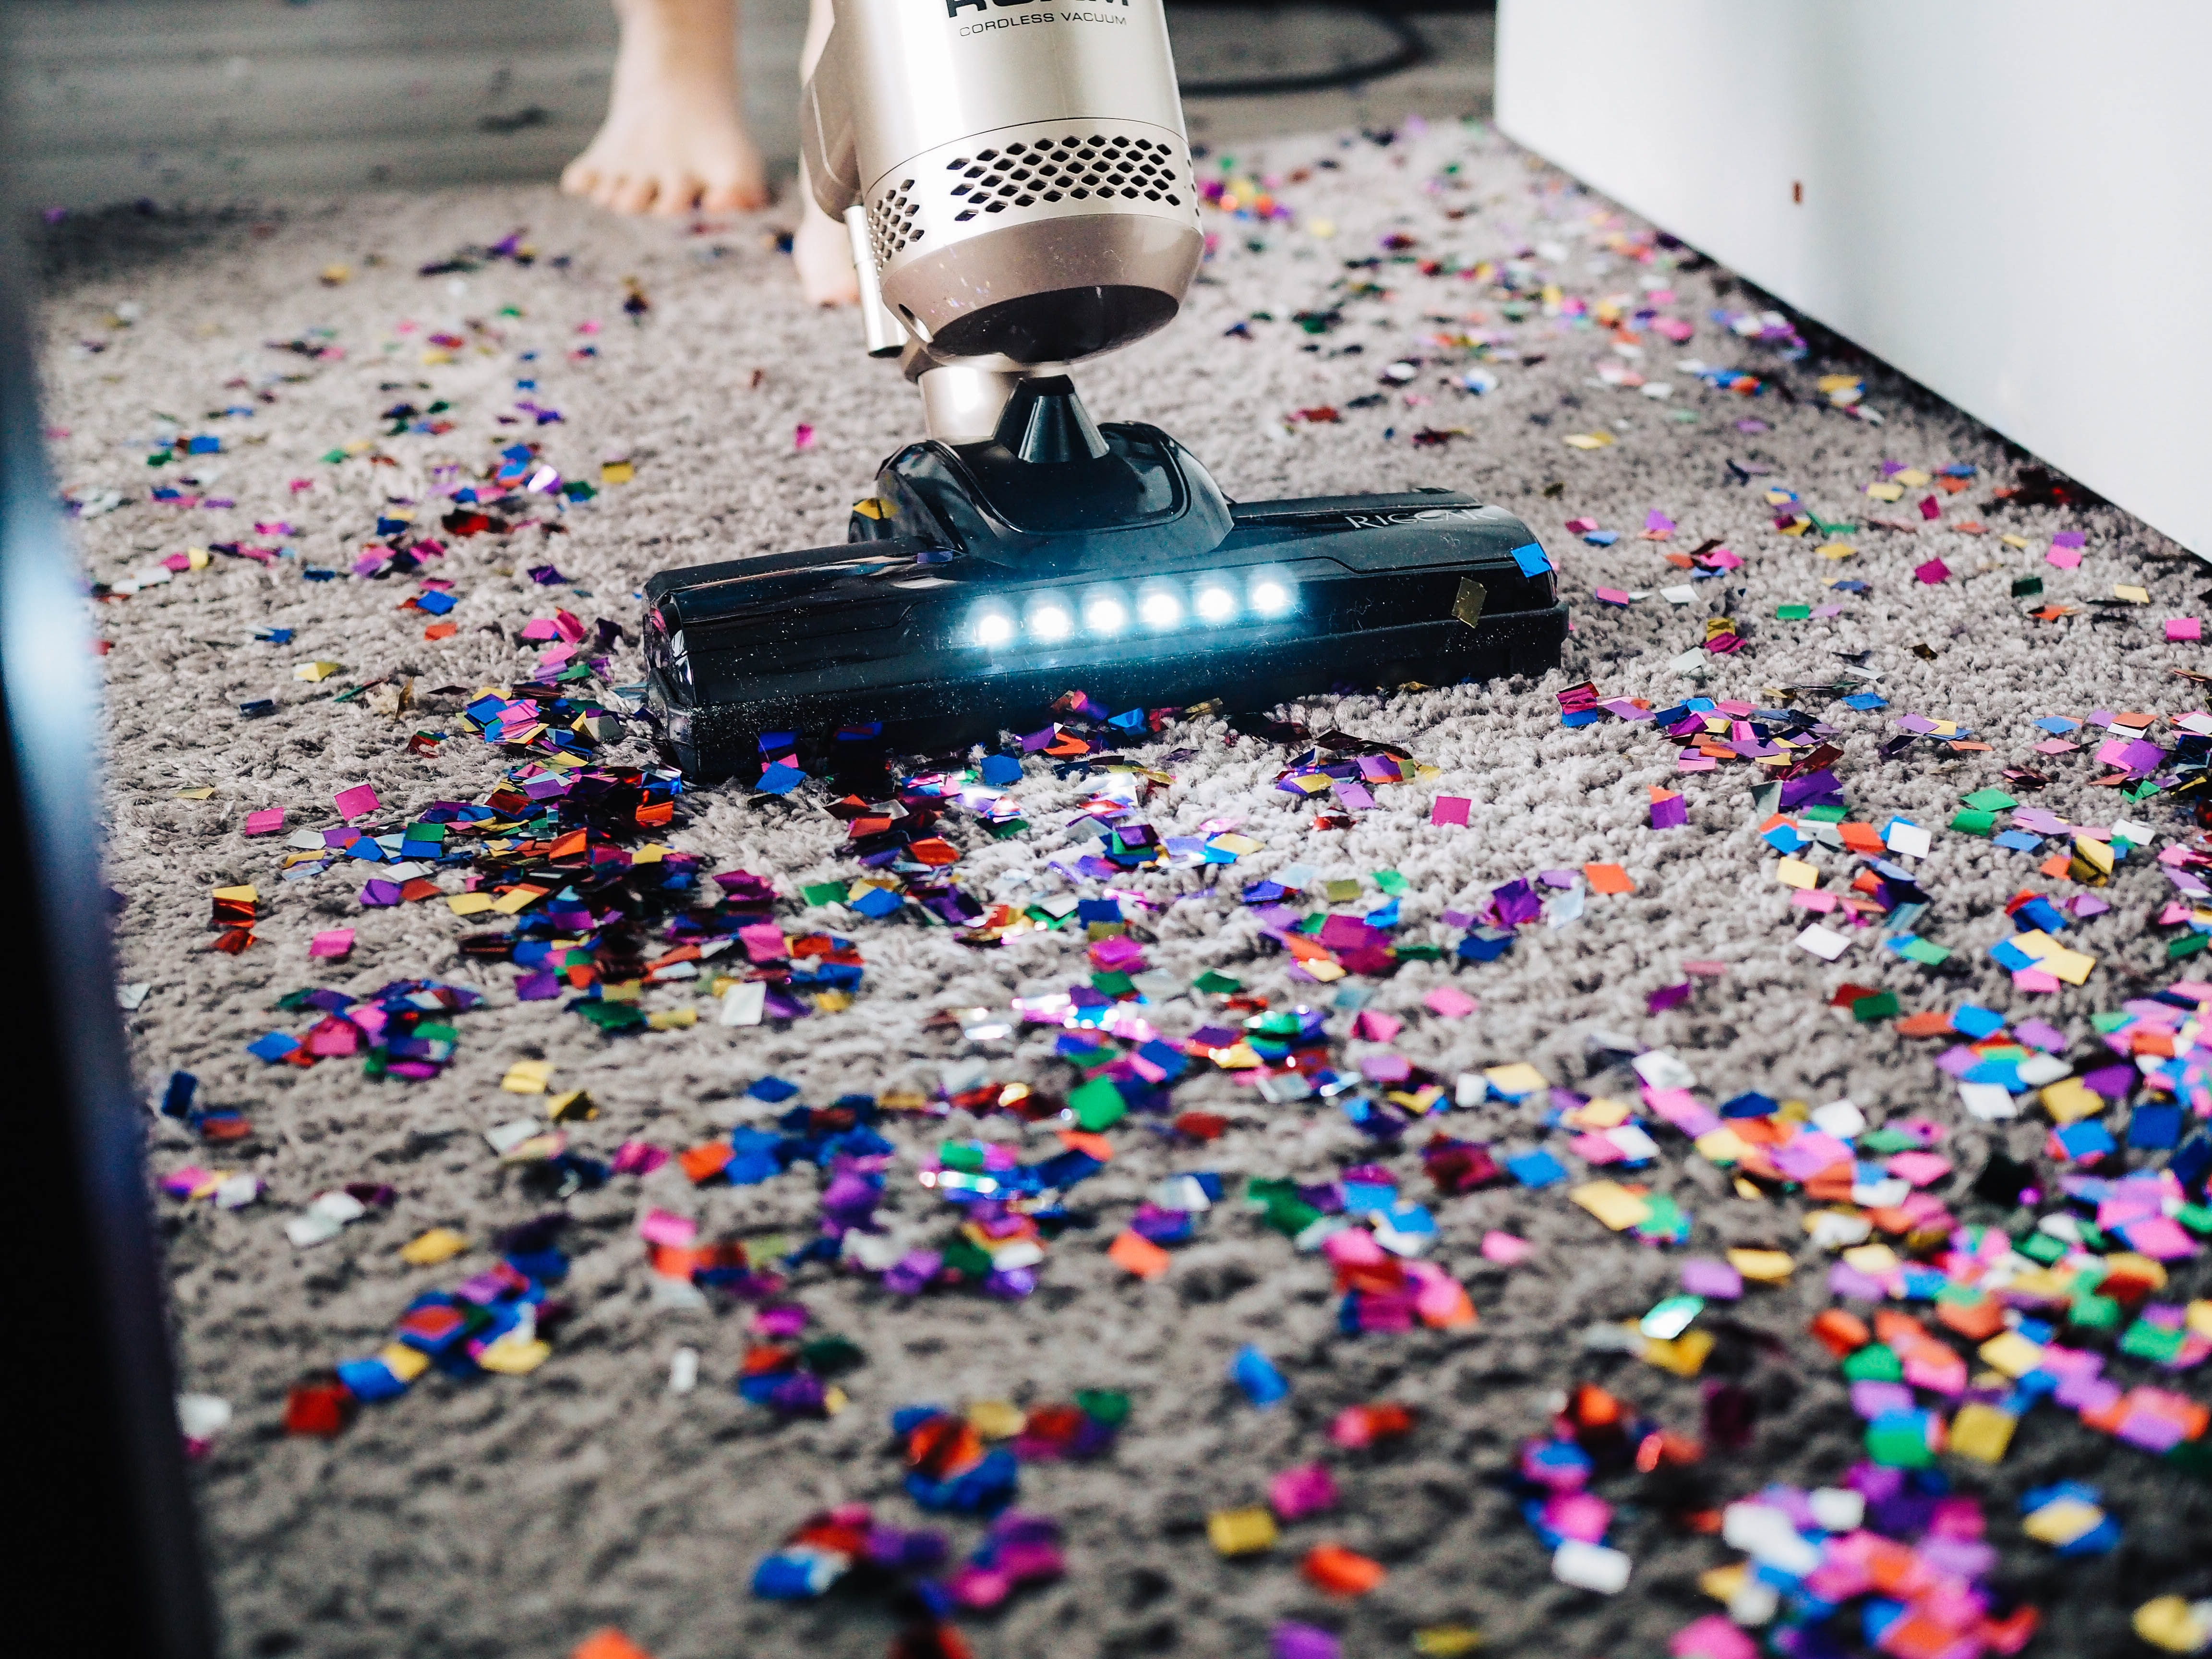 My Vacuum Cleaner – My Best Friend